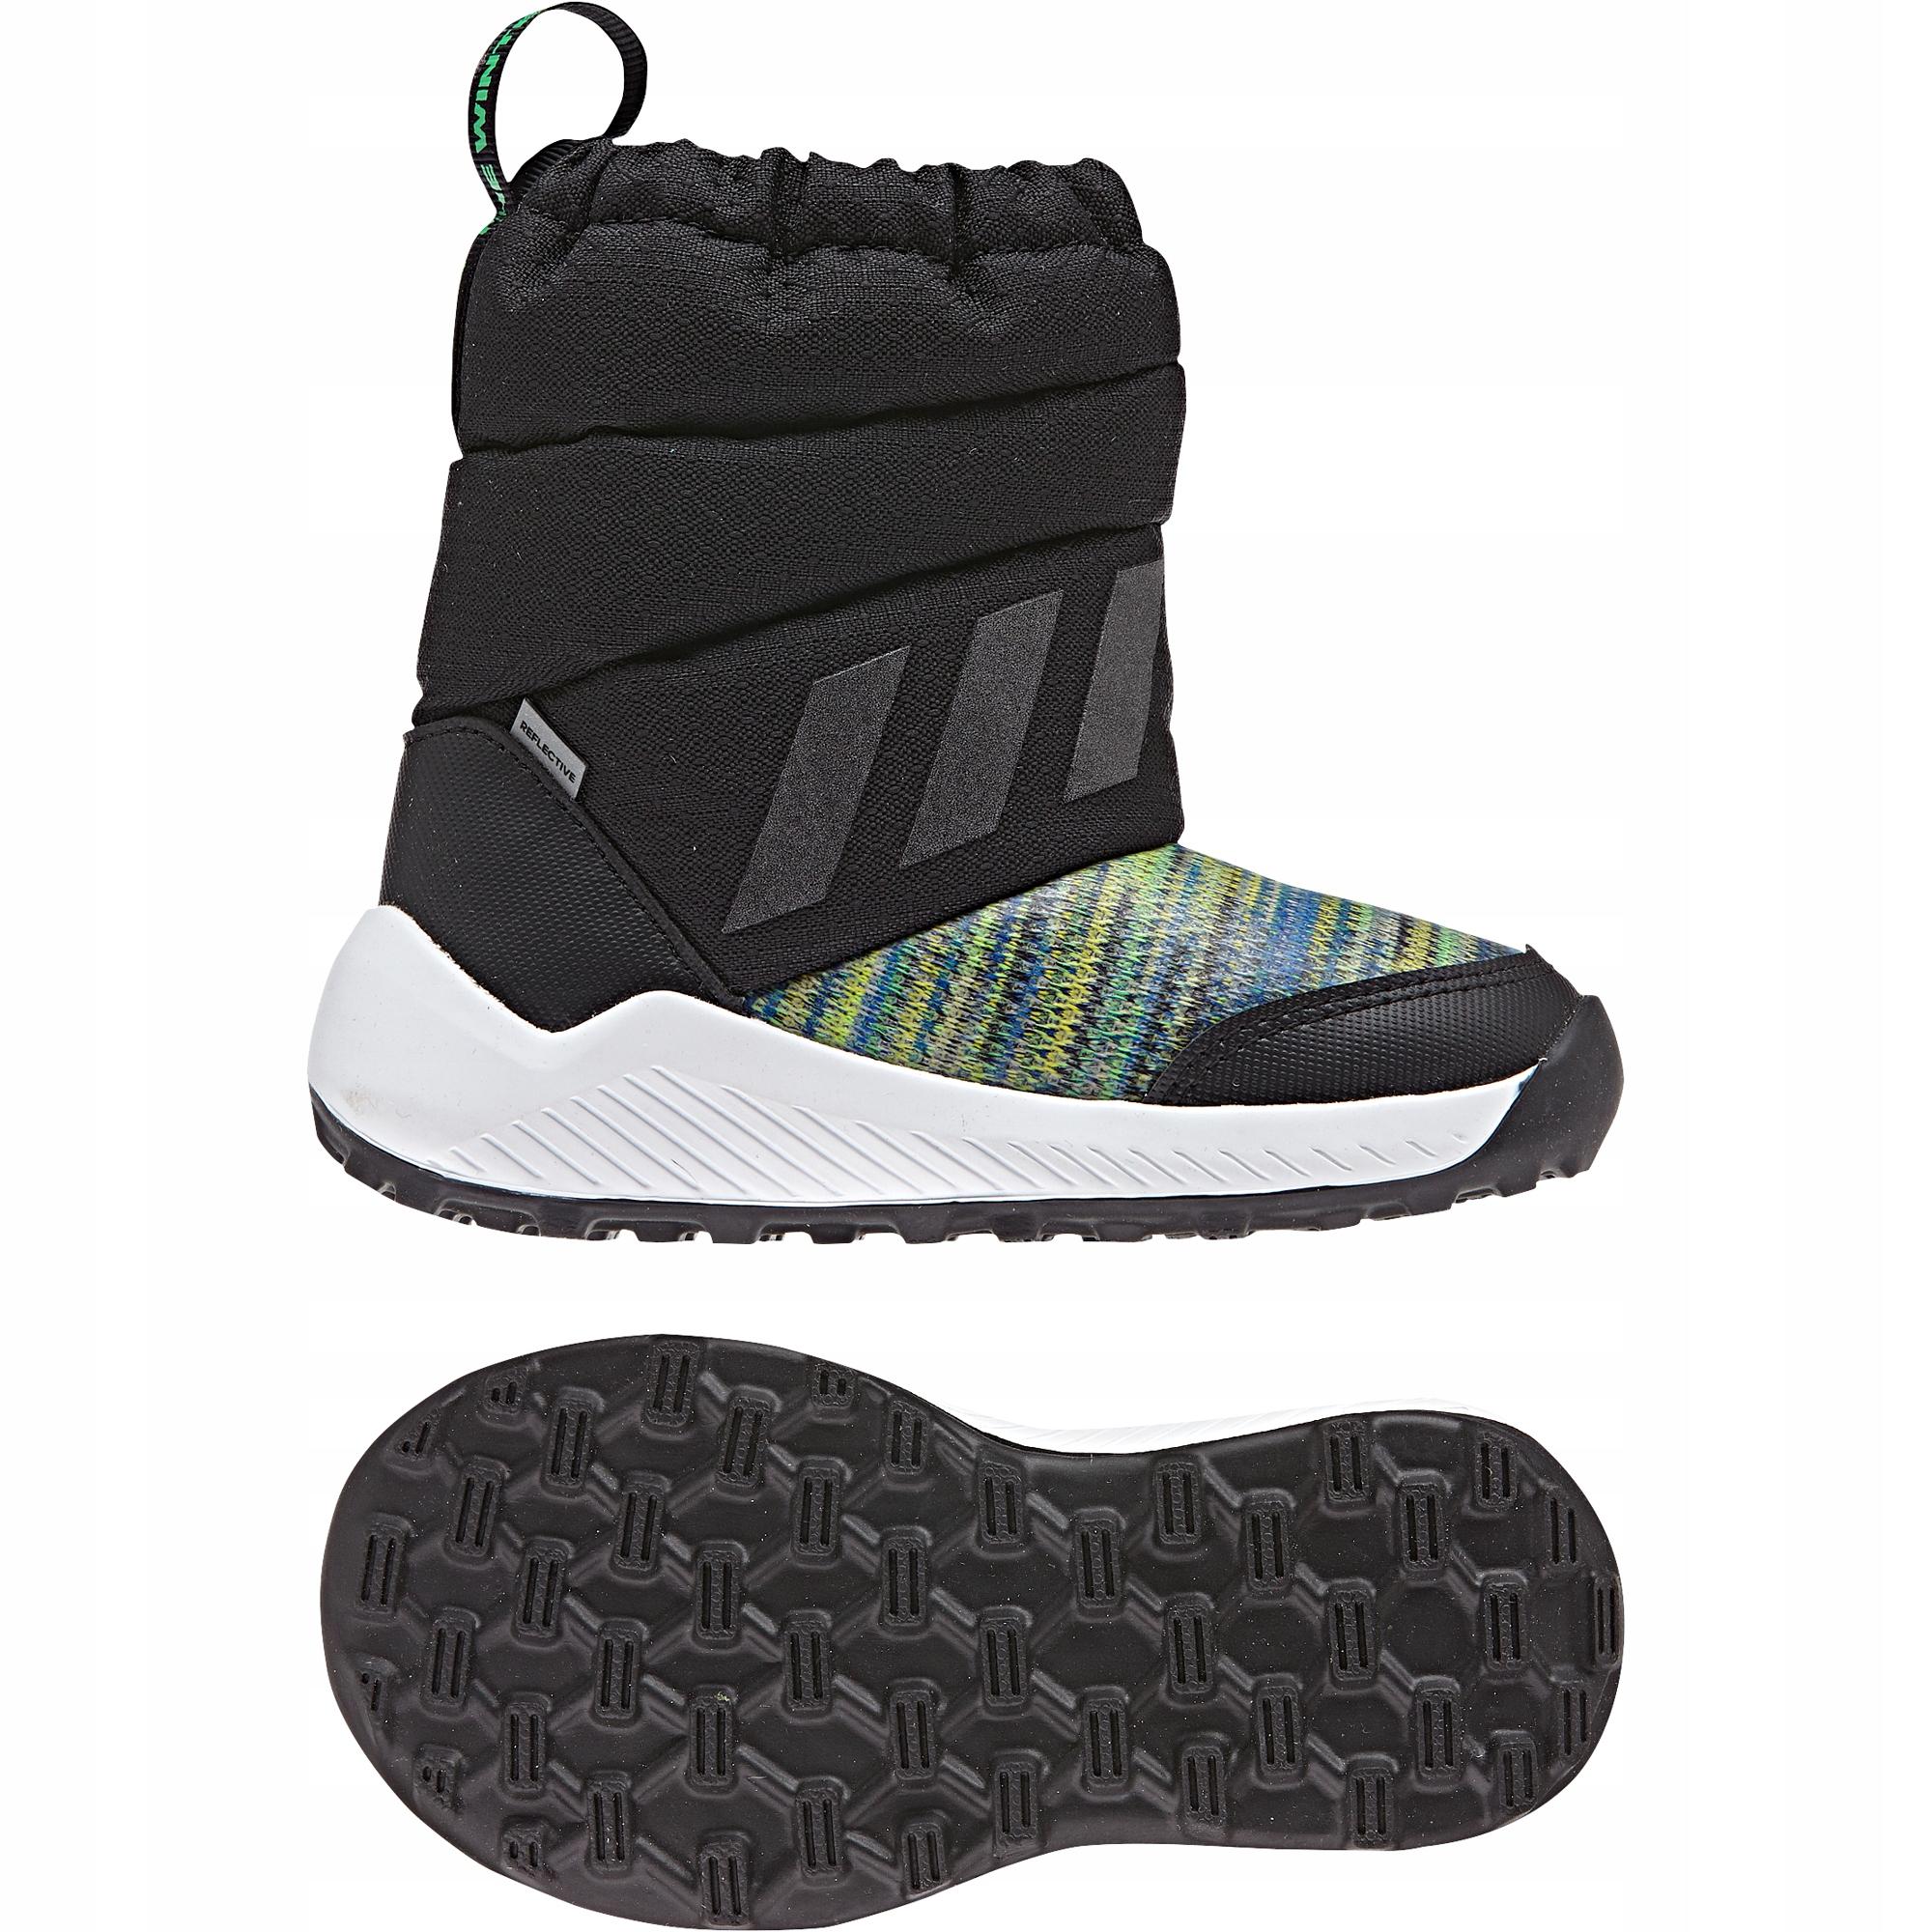 adidas Originals buty zimowe Navvy 2 M20646 46 23